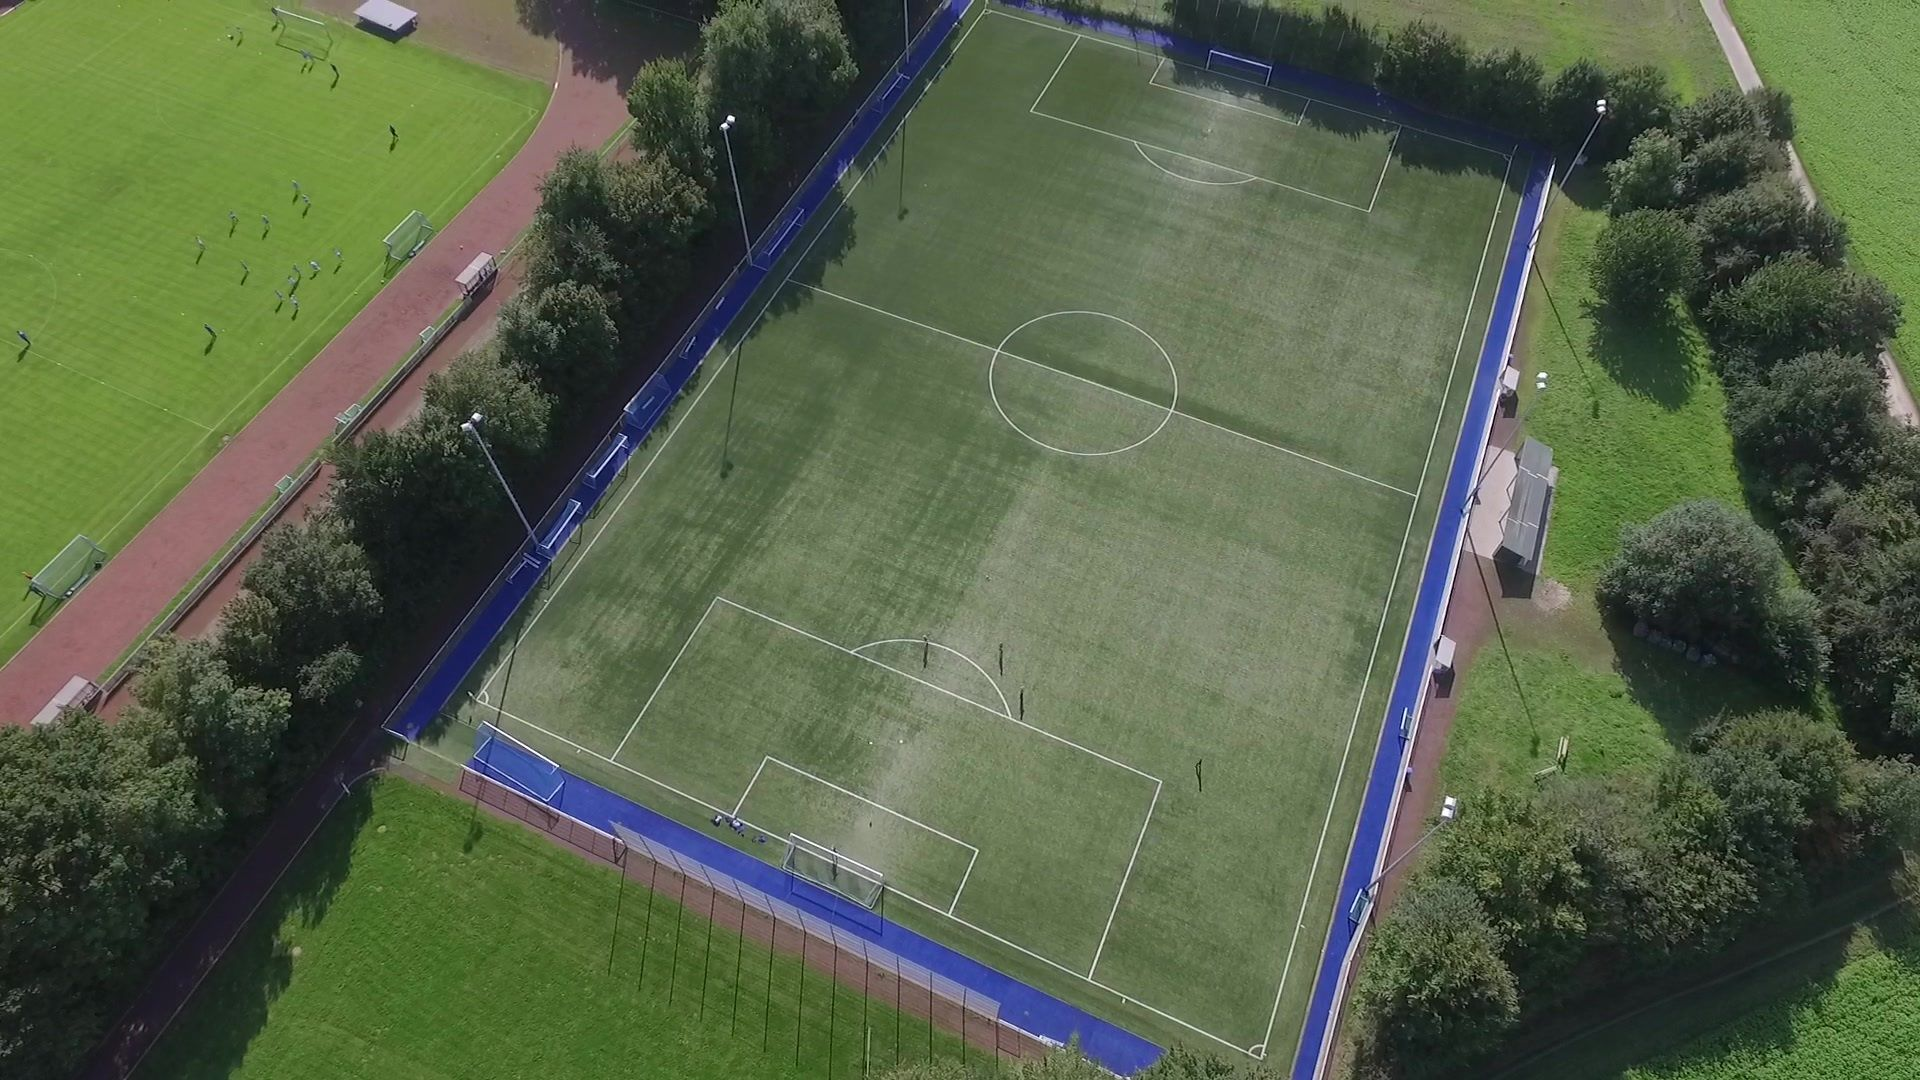 Unsere Sportstätten | SV 1924 Glehn e.V.